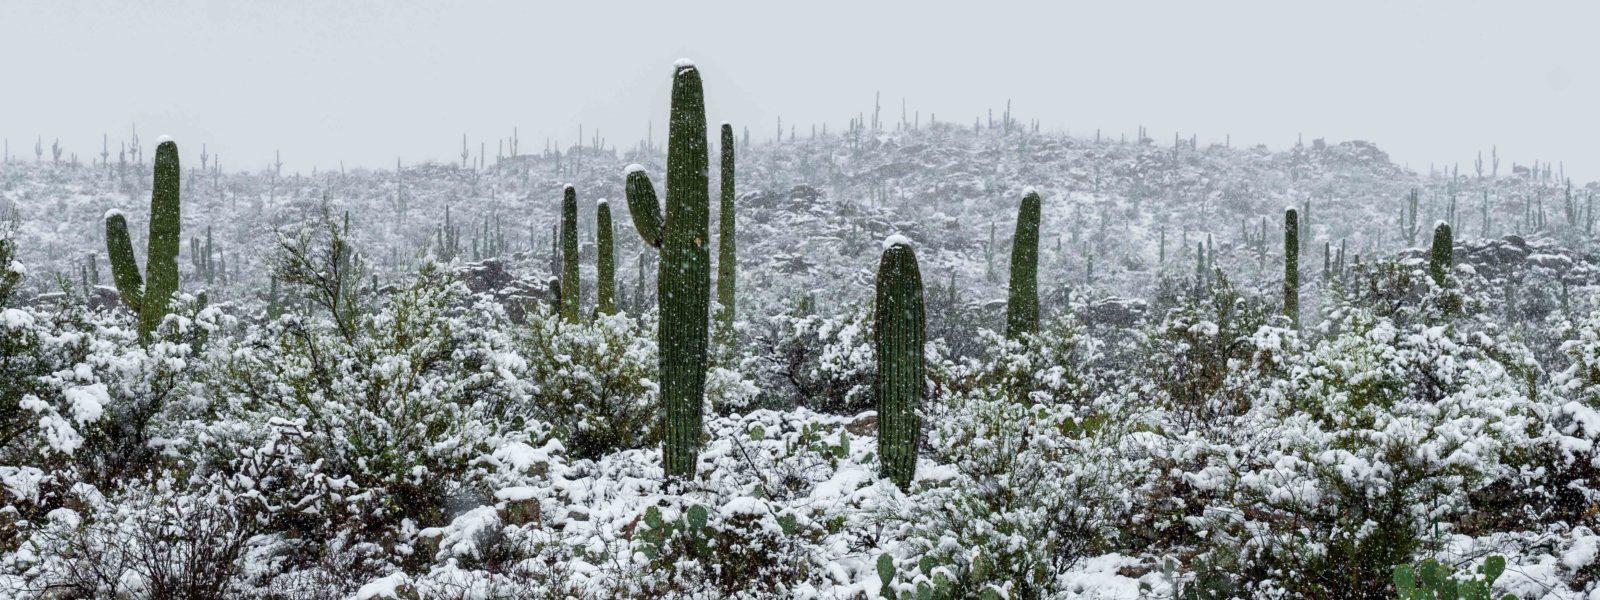 episode art - desert snow, for Luchadora